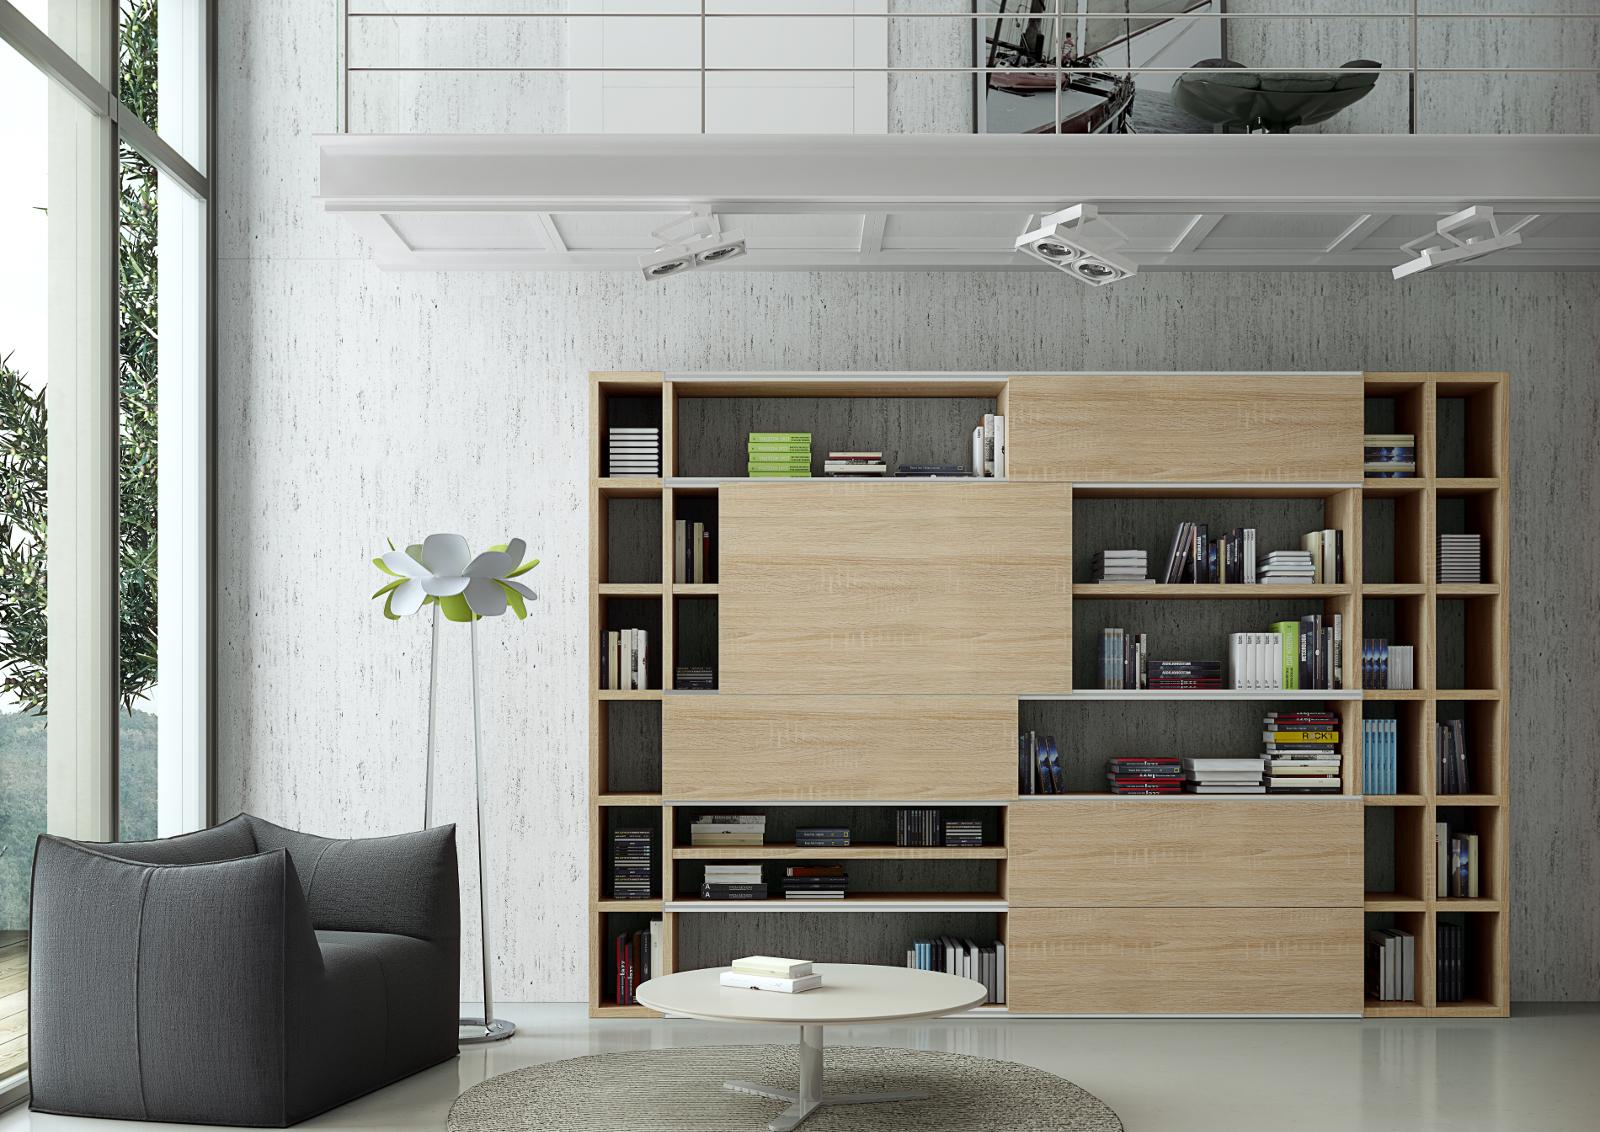 wohnwand b cherwand eiche natur kommode w rfel. Black Bedroom Furniture Sets. Home Design Ideas